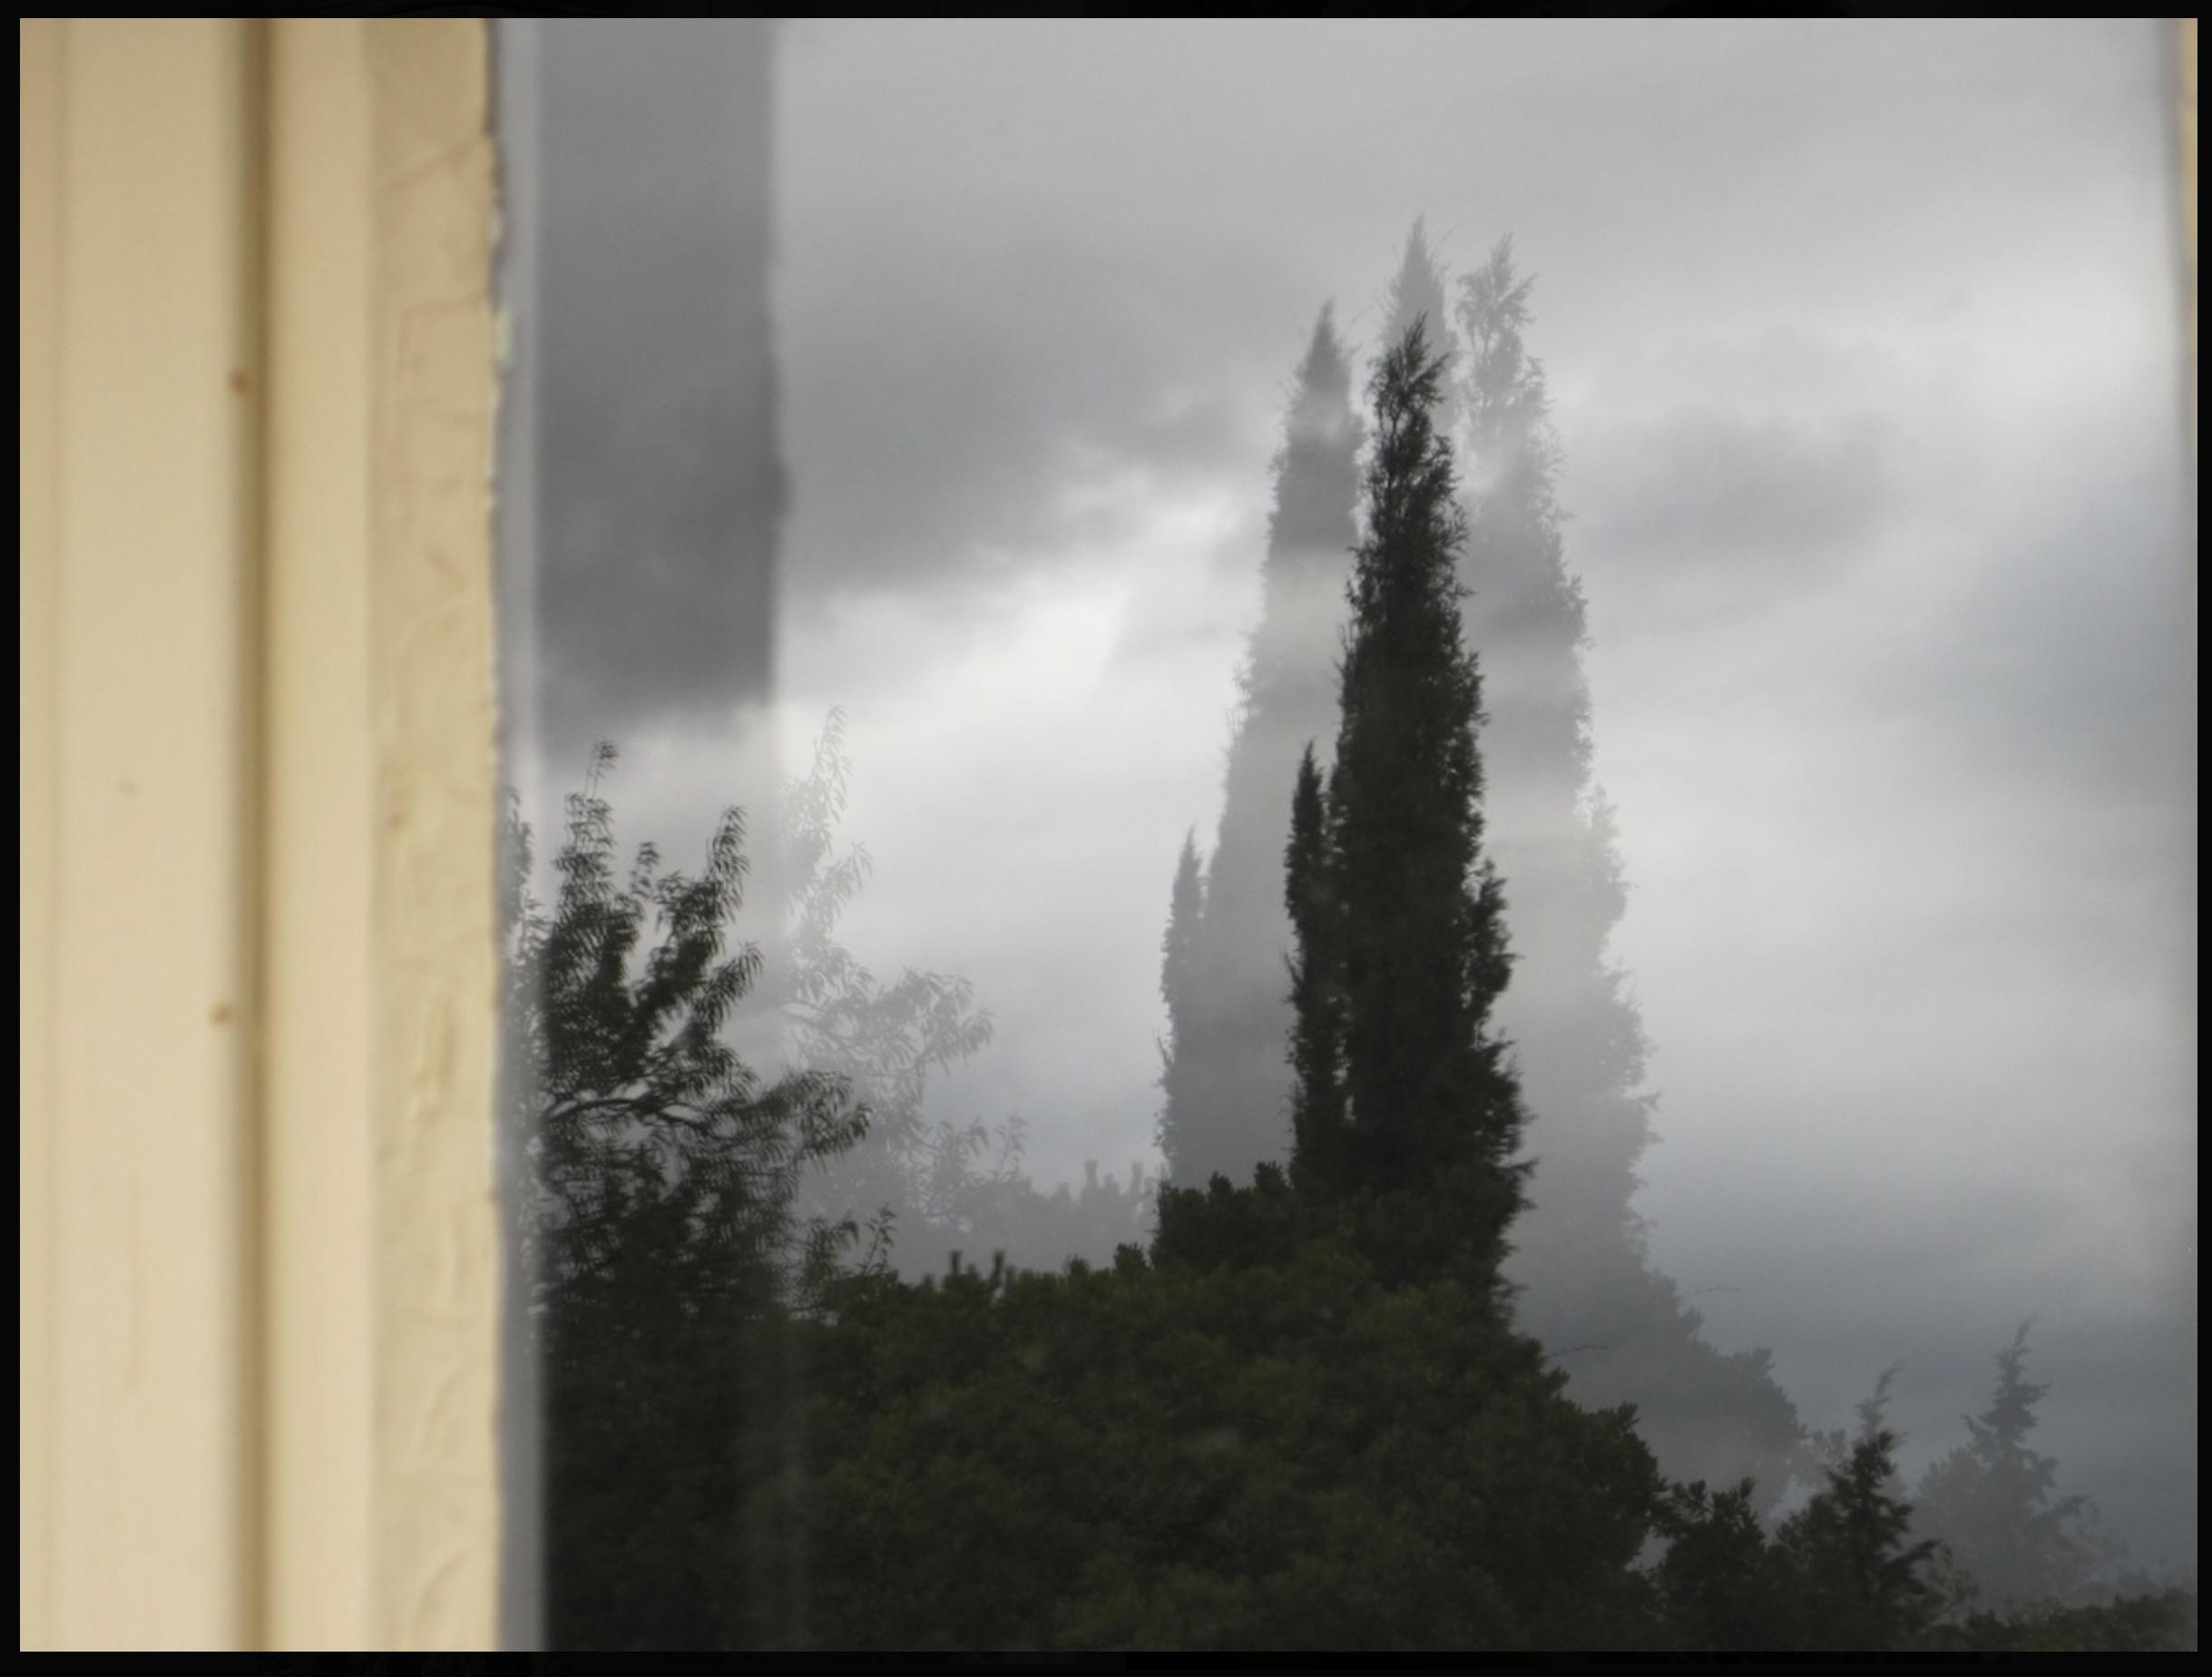 Screen Shot 2017-06-29 at 10.14.37 AM.jpg